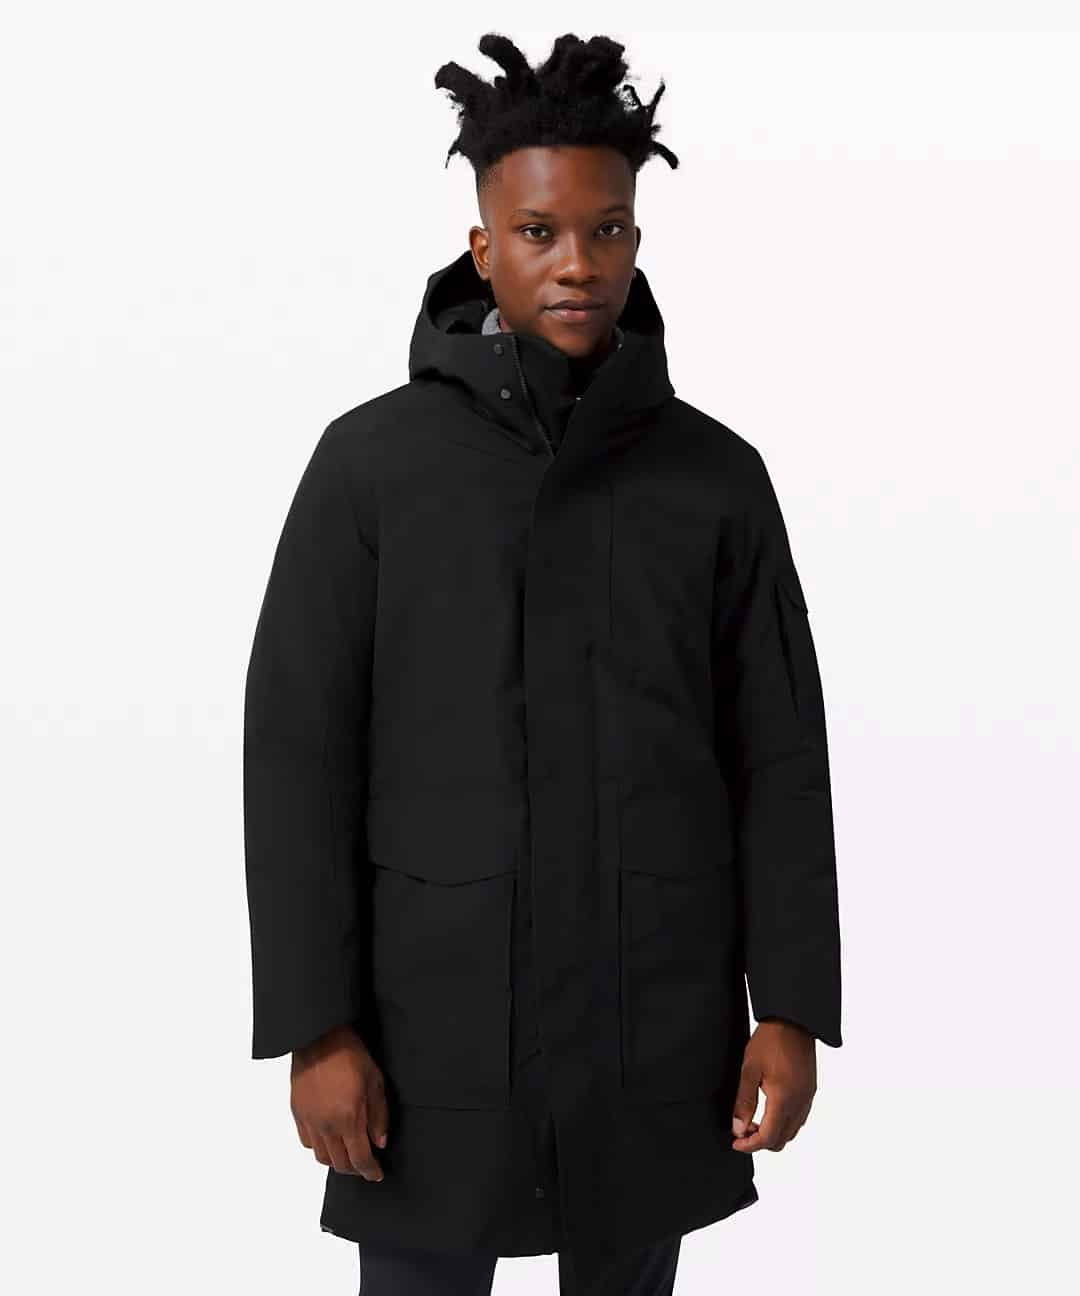 Cold City Parka | Men's Jackets & Coats | lululemon